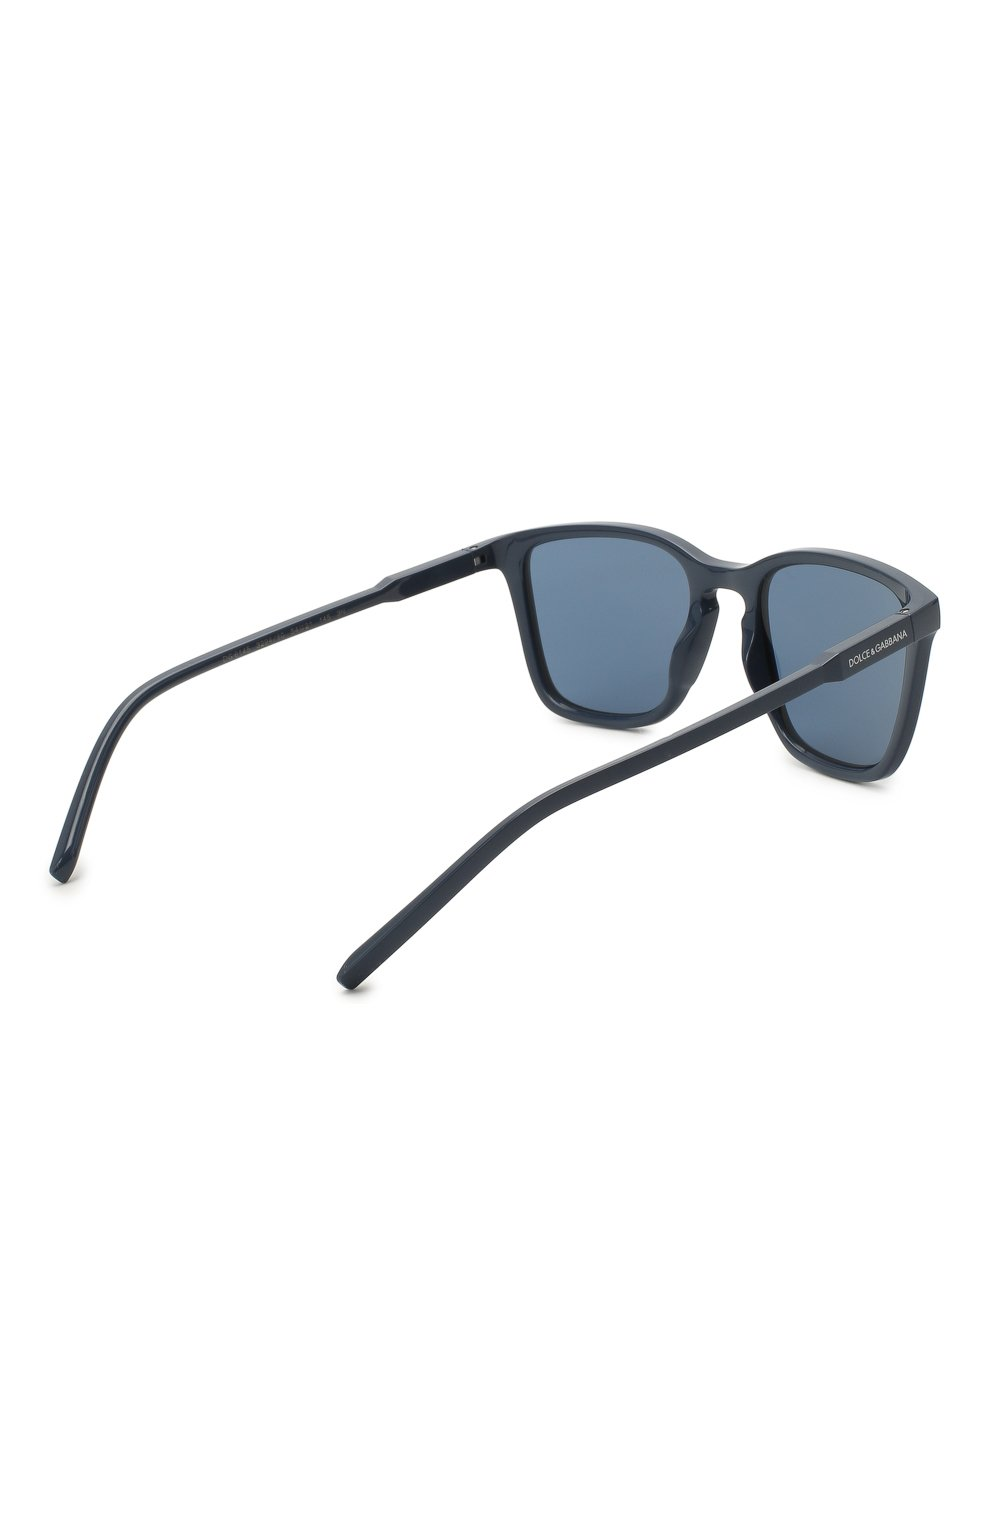 Мужские солнцезащитные очки DOLCE & GABBANA синего цвета, арт. 6145-329480   Фото 4